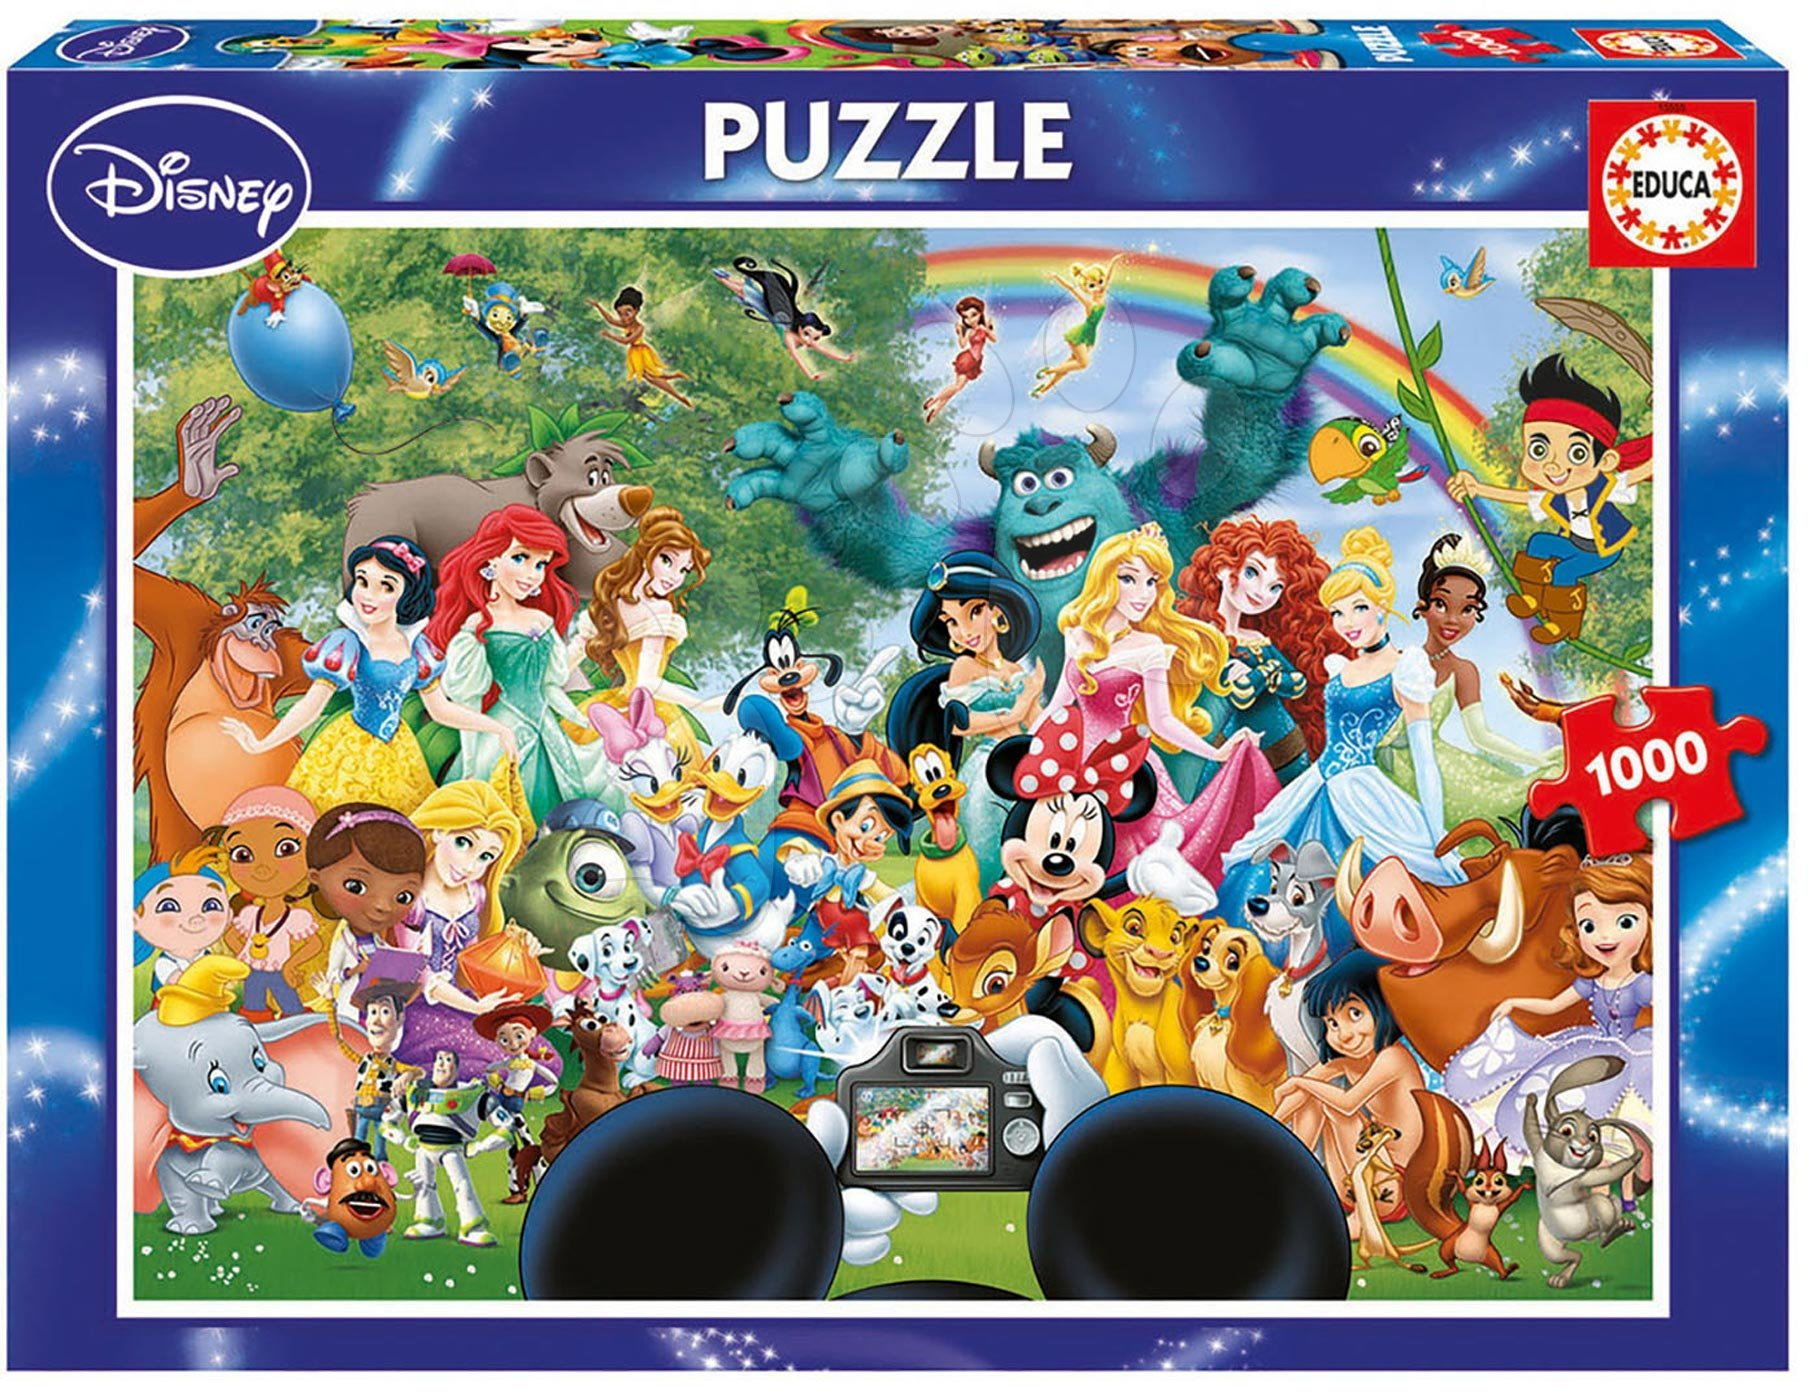 Puzzle 1000 dielne - Puzzle Disney Family The Marvelous World of Disney II. Educa 1000 dielov od 12 rokov